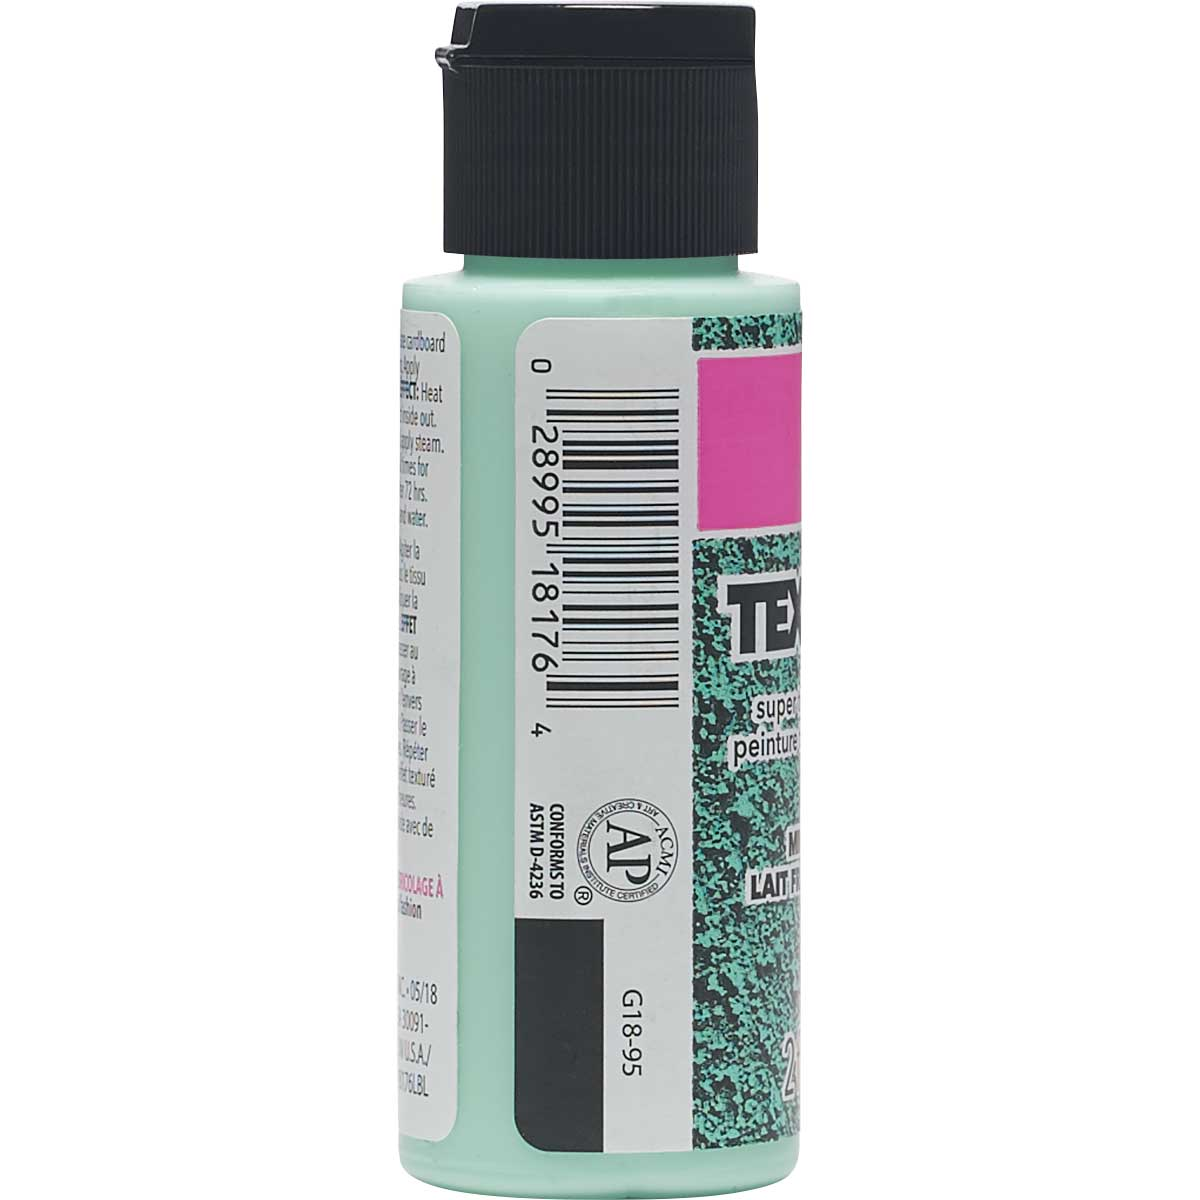 LaurDIY ® Texturific™ Fabric Paint - Mint MIlkshake, 2 oz.